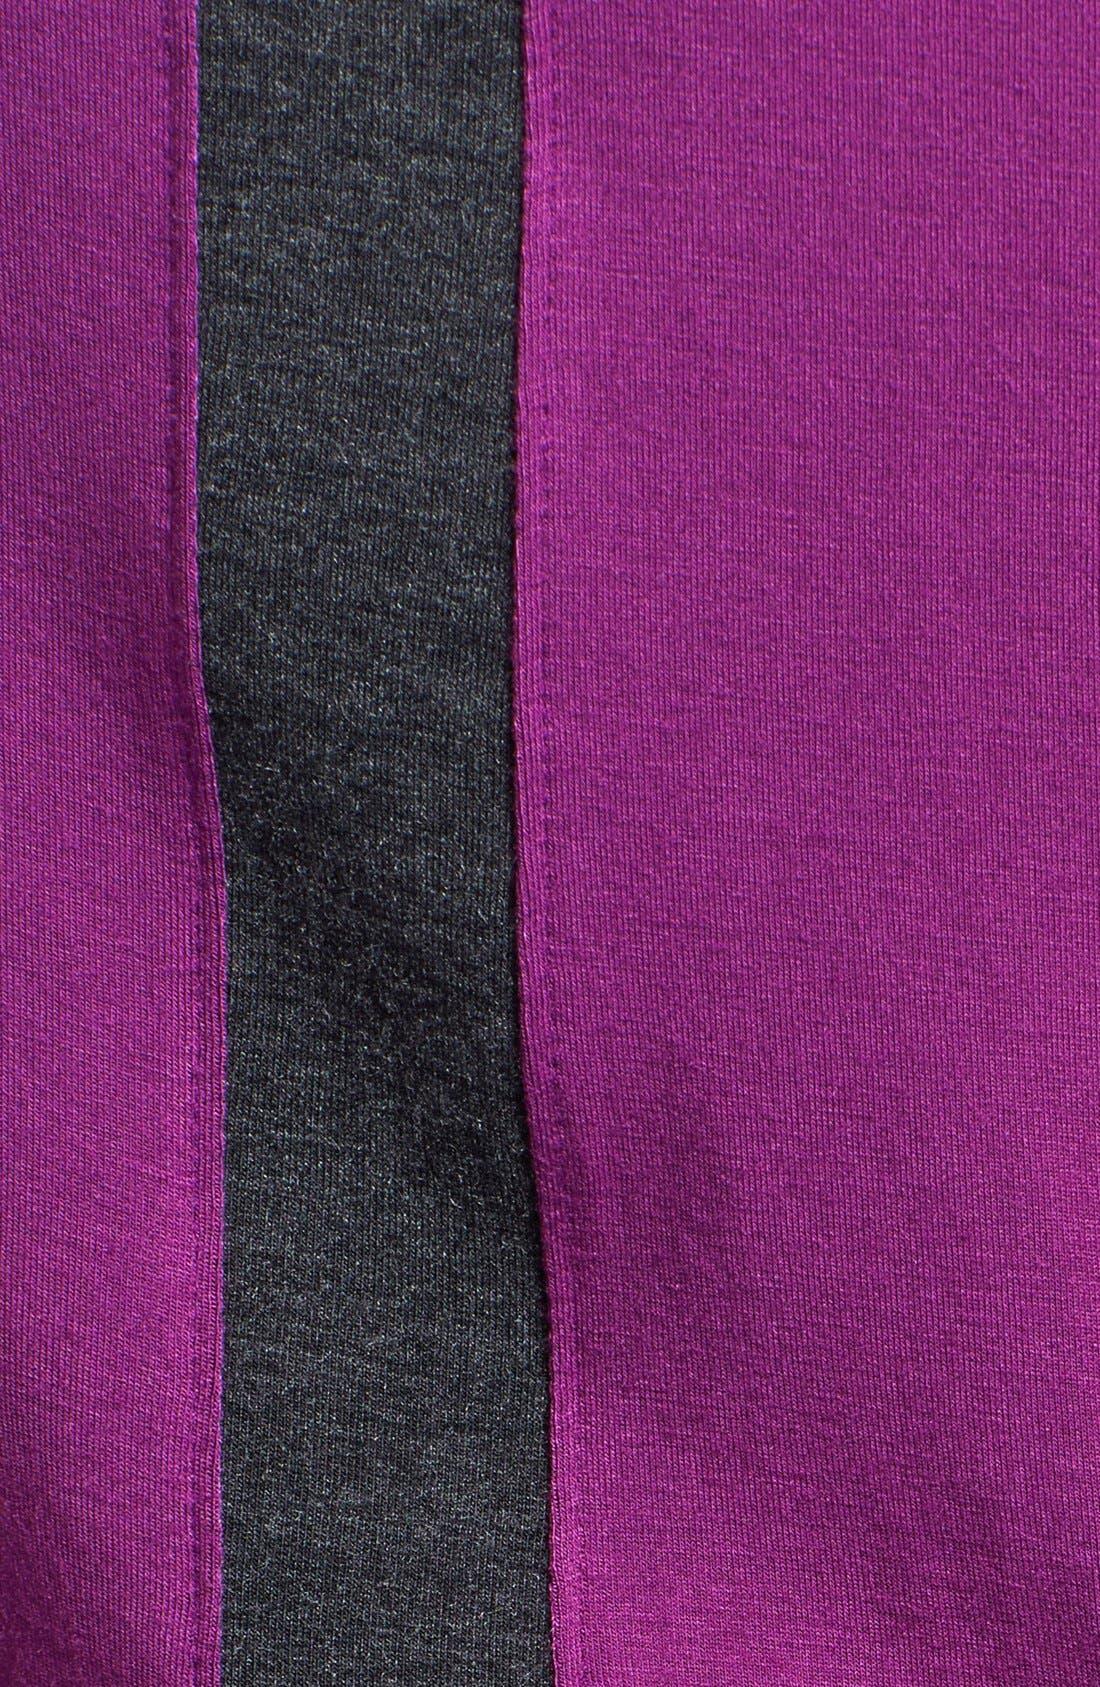 Contrast Stripe Racerback Maxi Dress,                             Alternate thumbnail 3, color,                             Purple Phlox/ Heather Charcoal